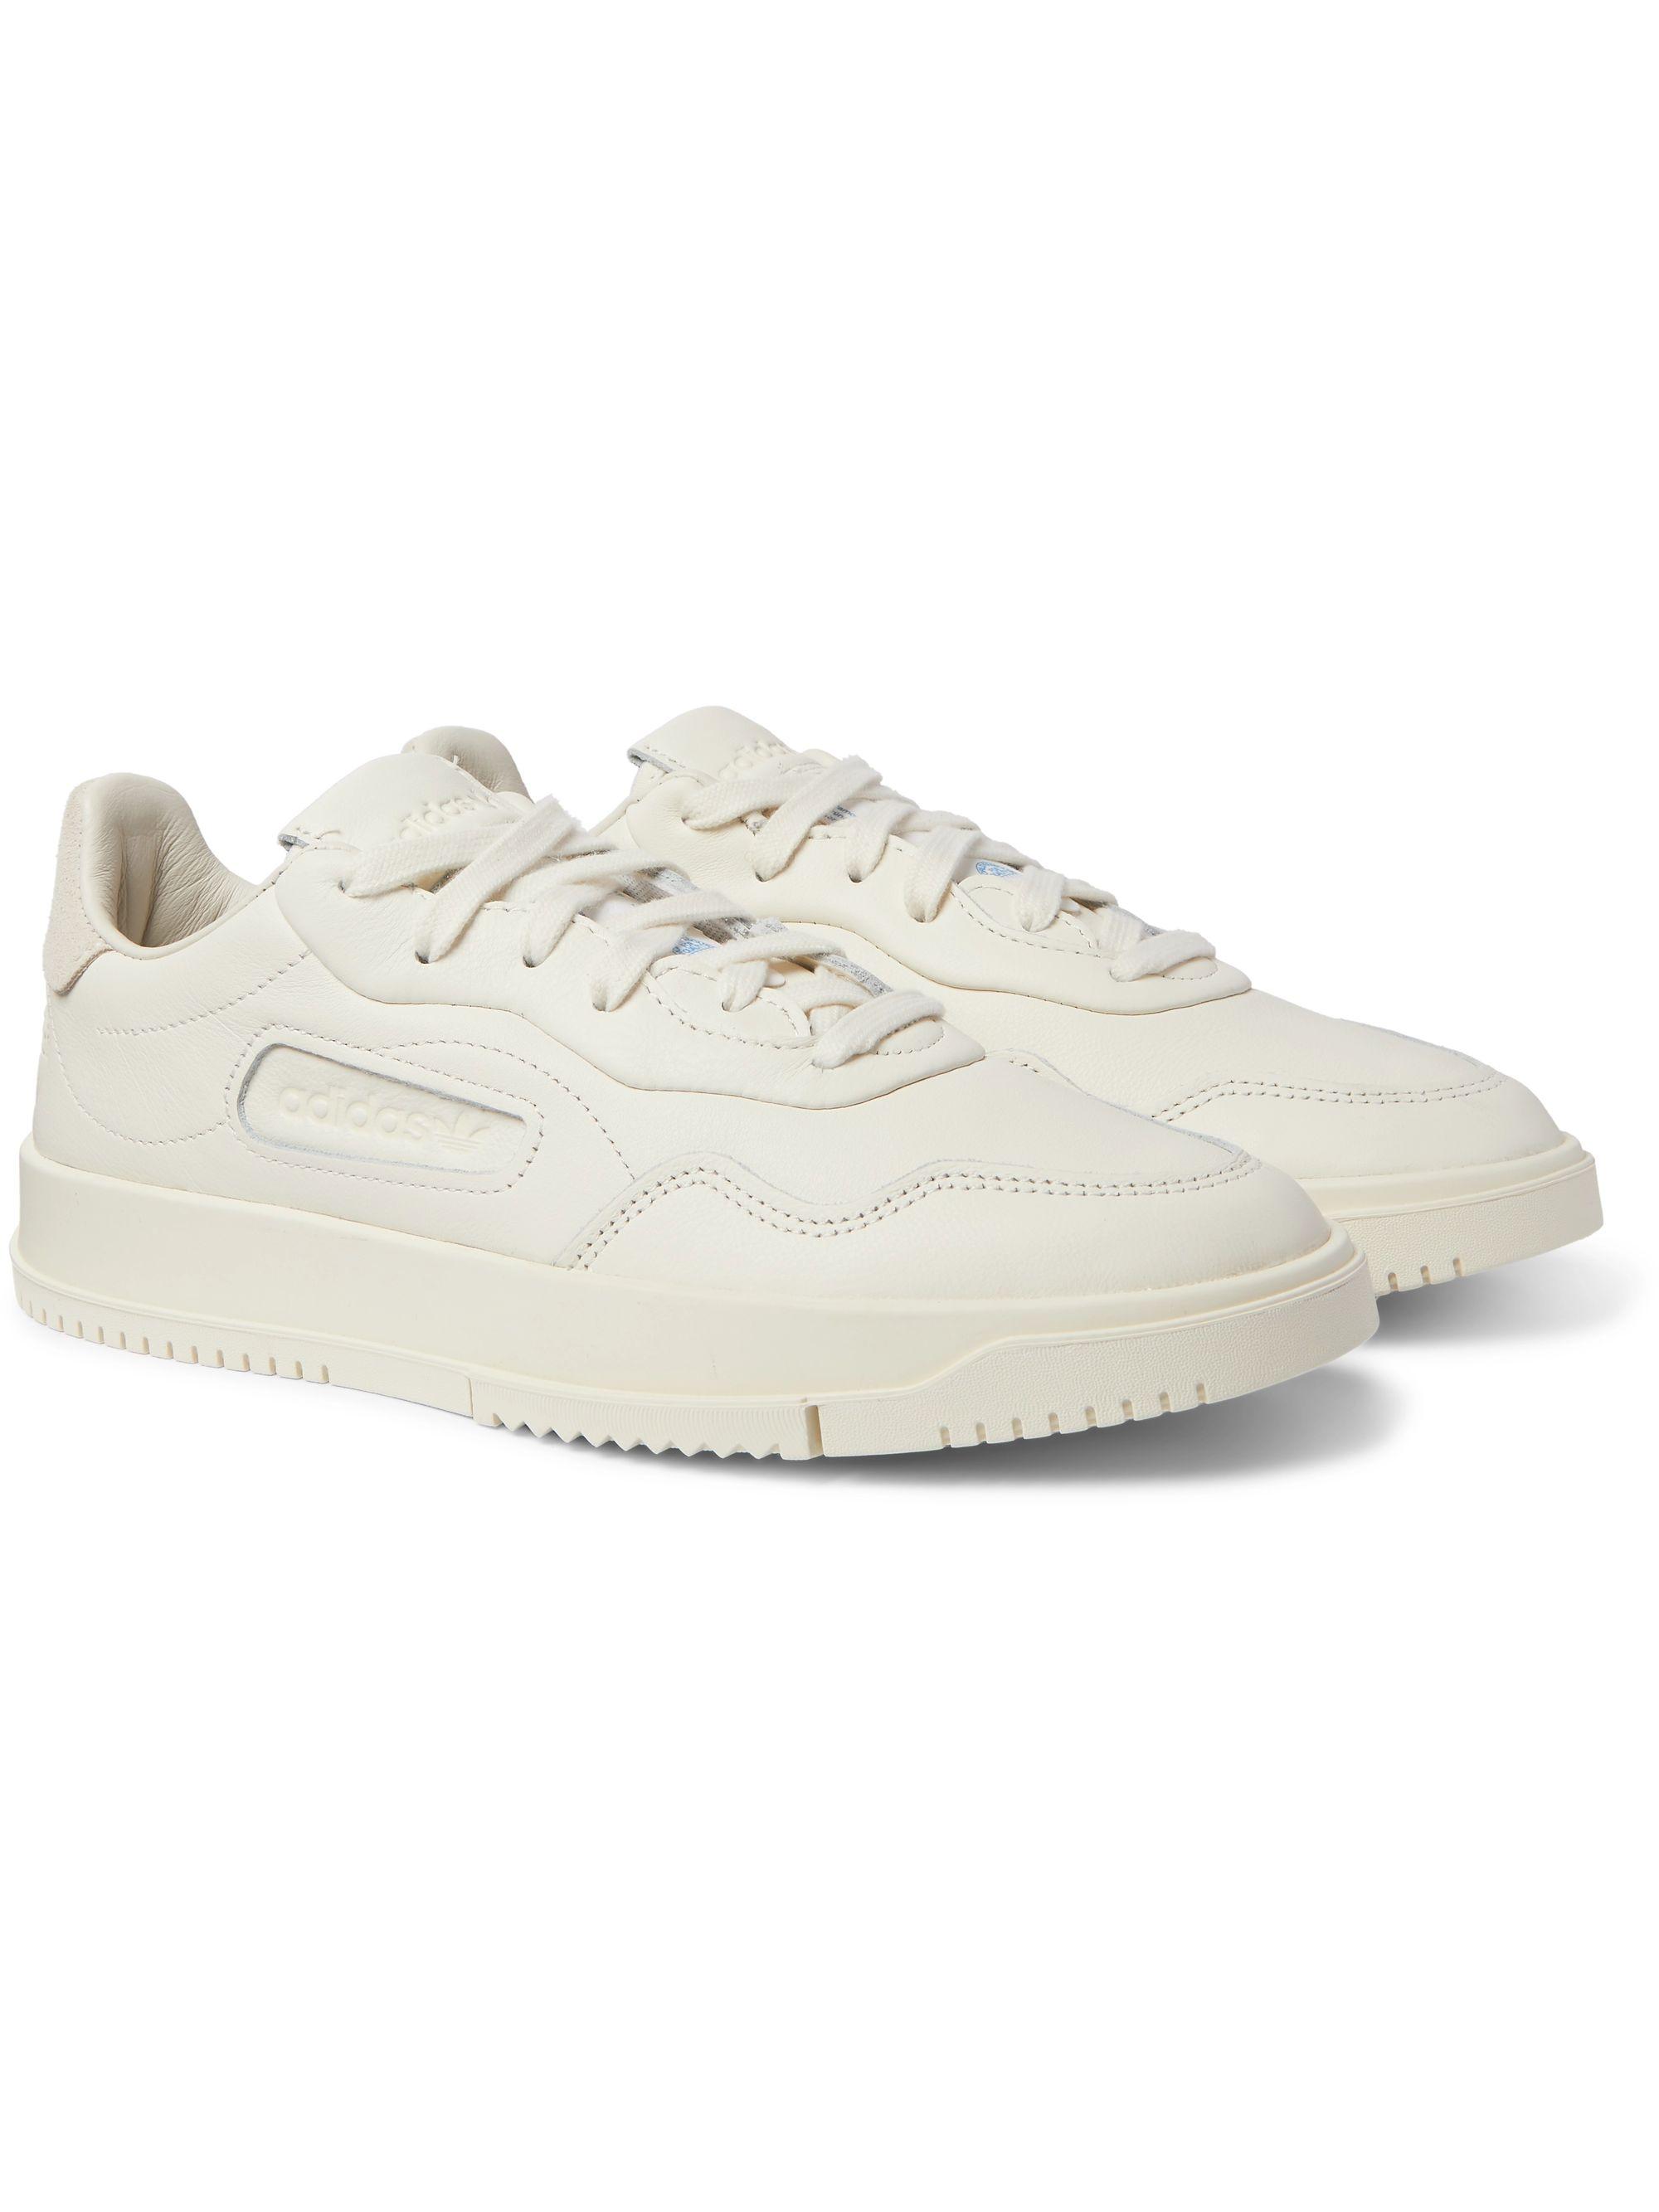 adidas SC Premiere Off White Off White Off White | Footshop